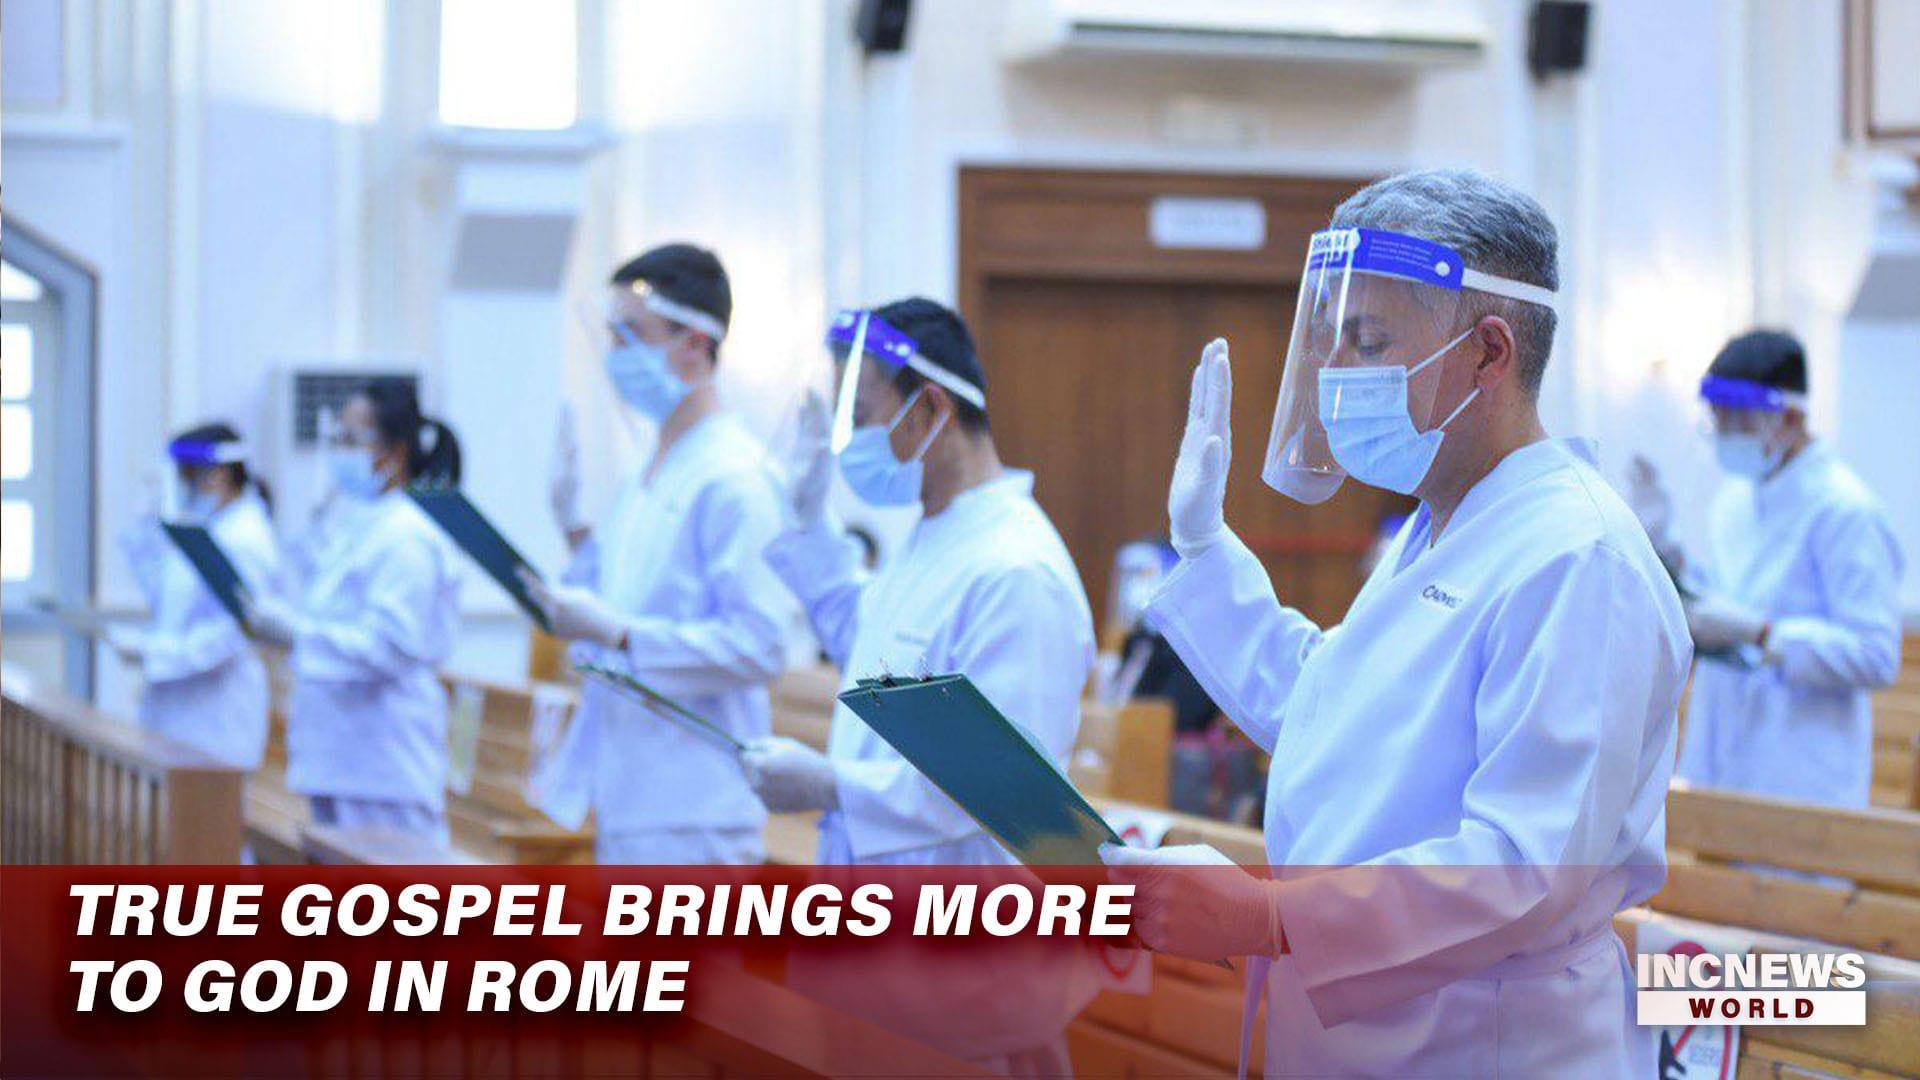 True Gospel Brings More to God in Rome